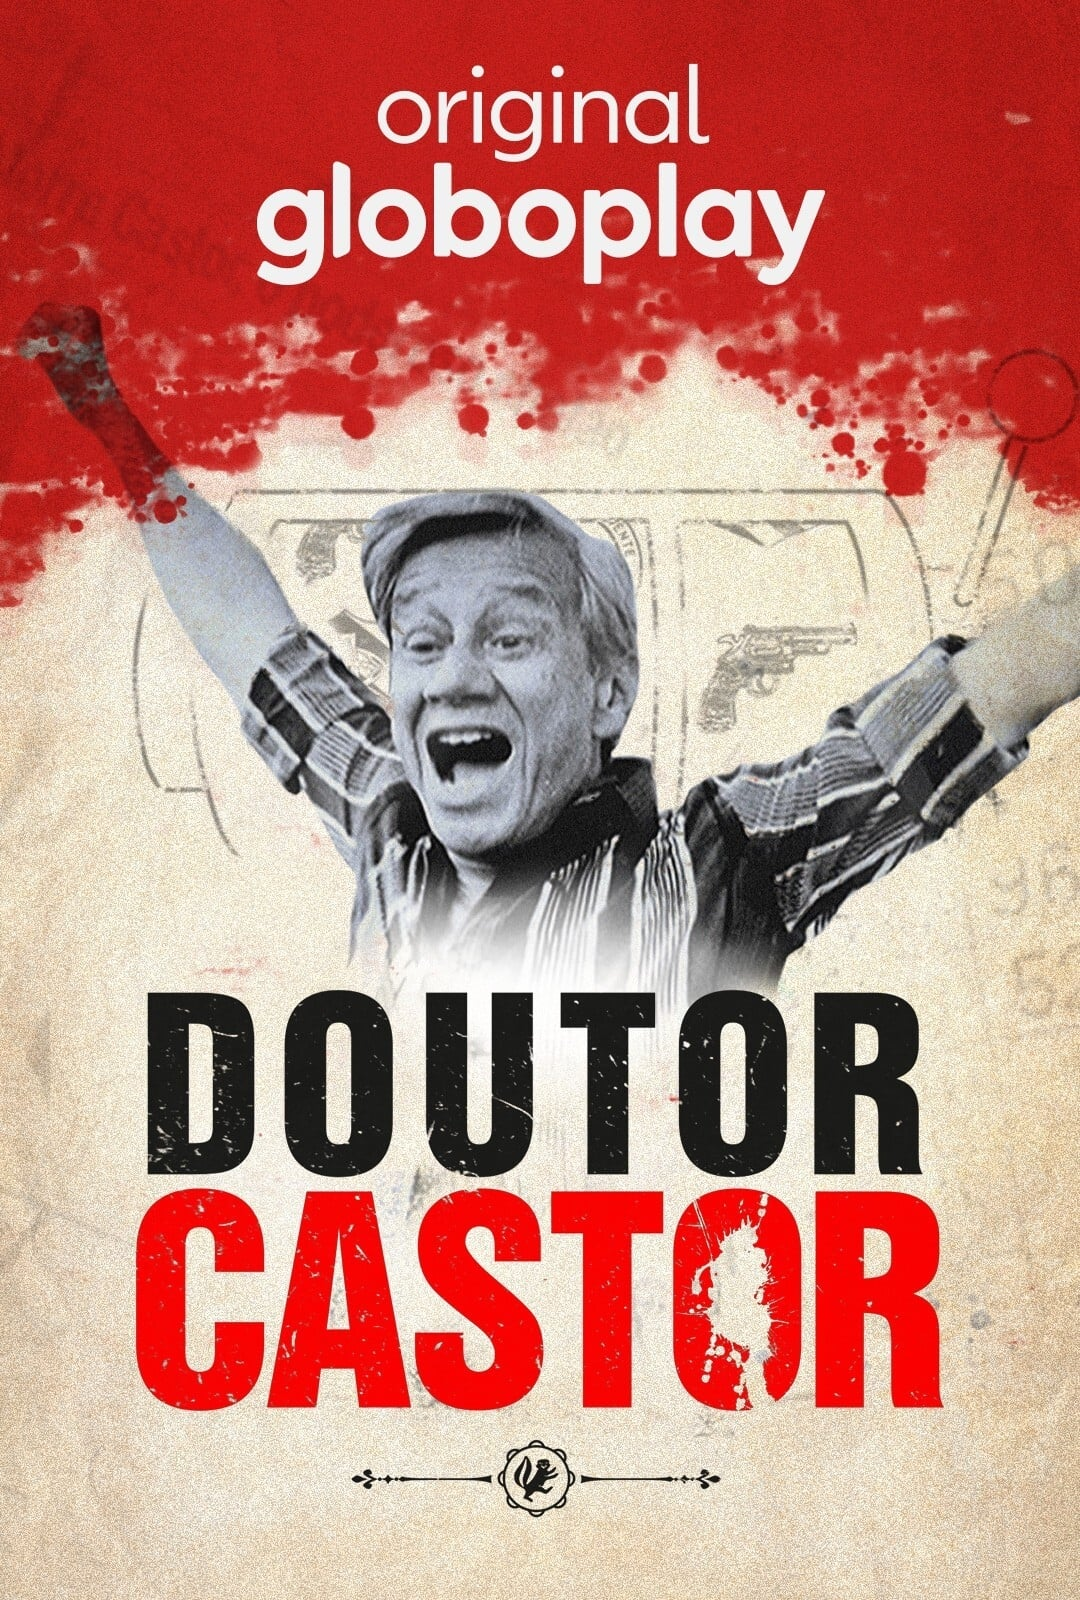 Doctor Castor (2021)